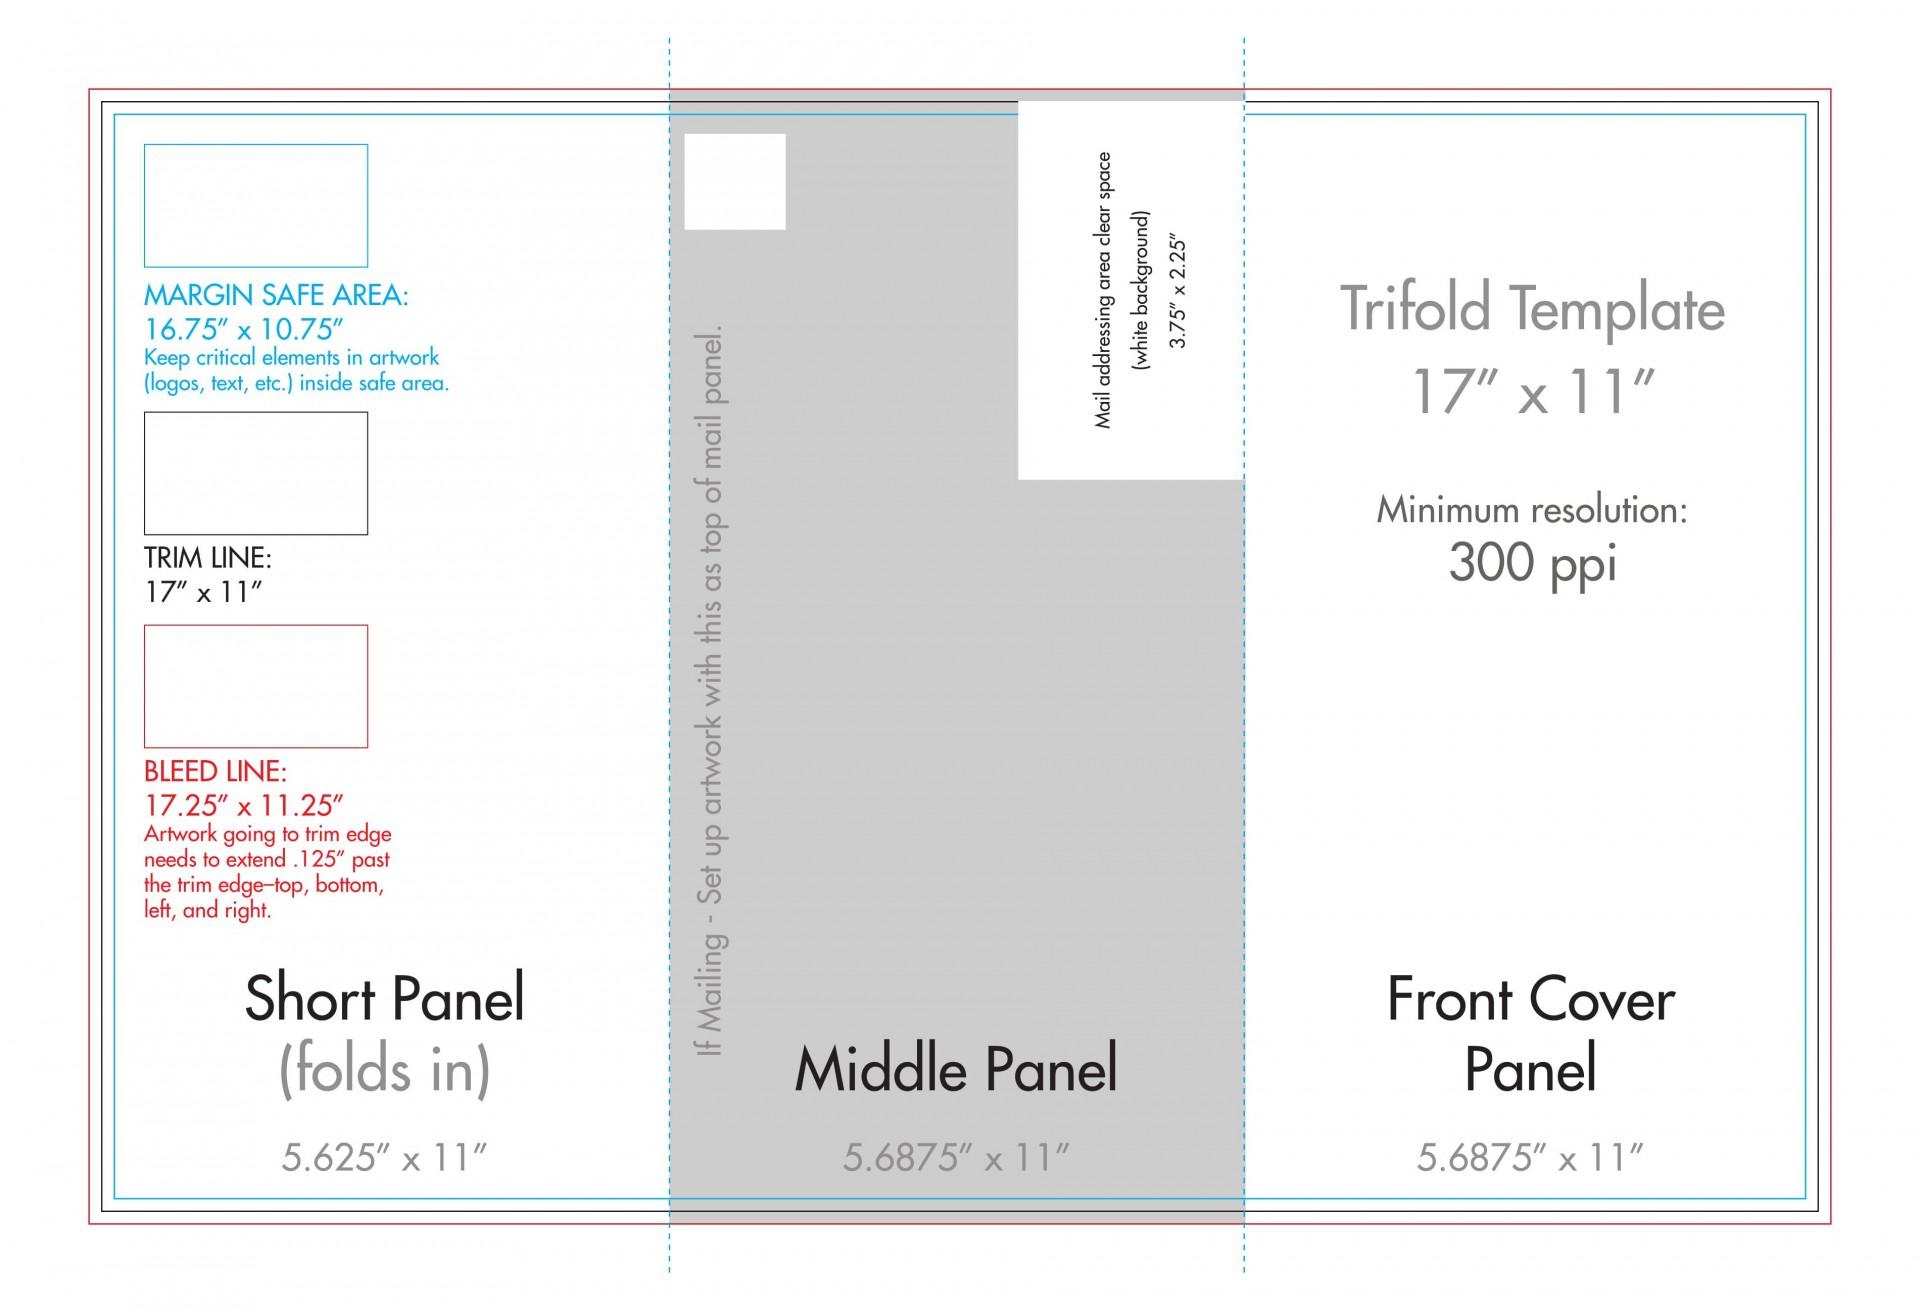 006 Rare Tri Fold Brochure Template Word Photo  2010 2007 Free1920